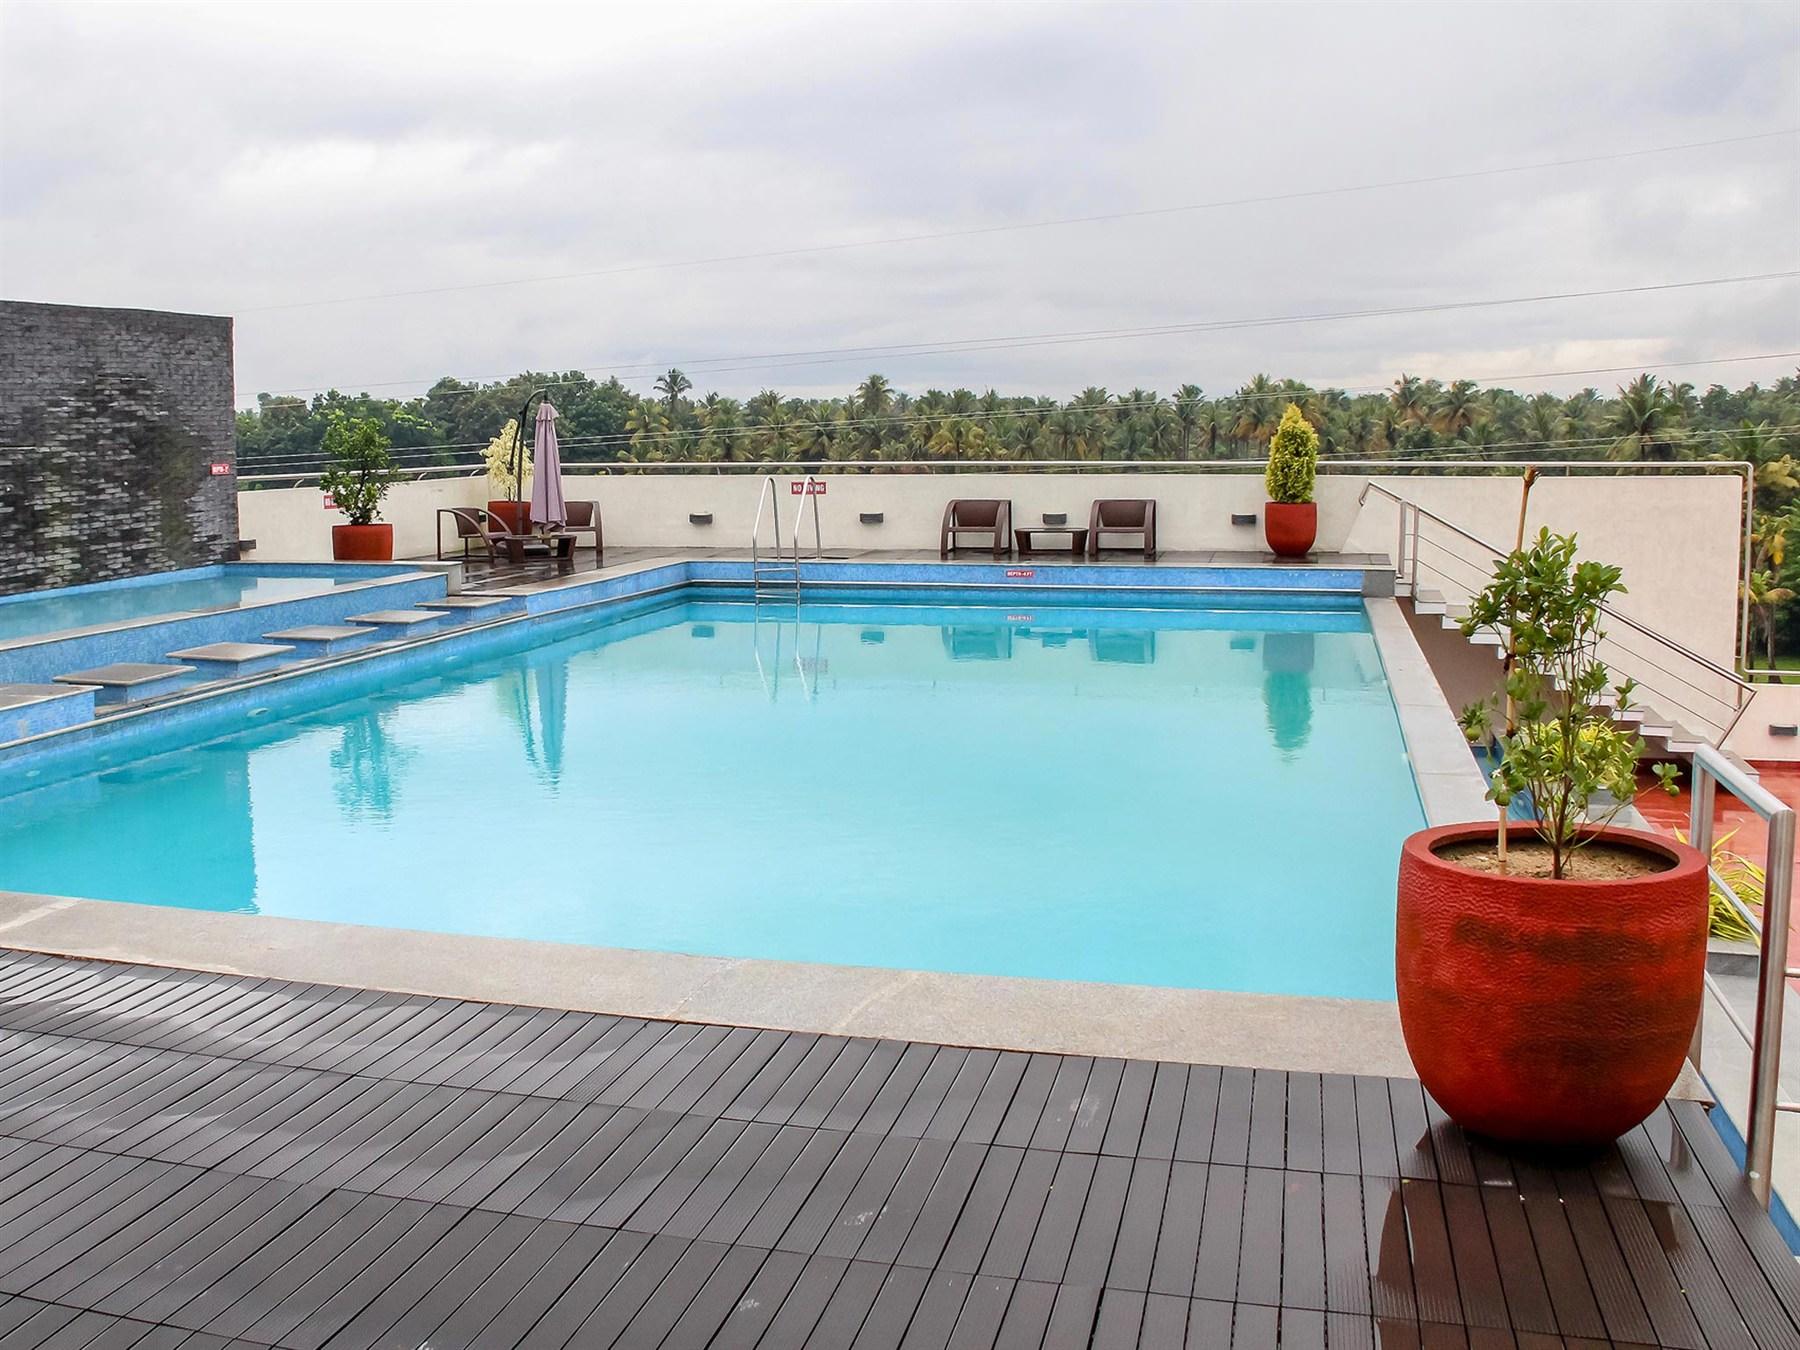 Hotel near domastic airport hotel hotel near by airport veg hotel - Flora Airport Hotel